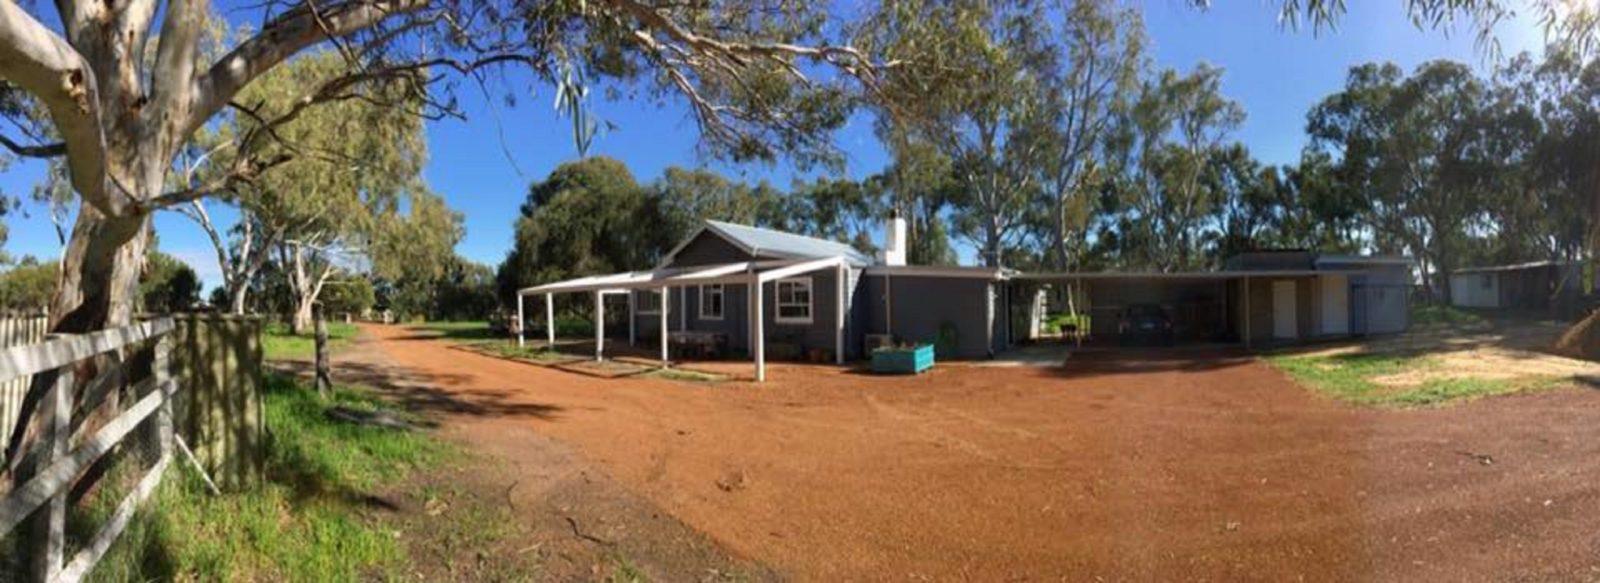 Aintree Cottage, Herne Hill, Western Australia